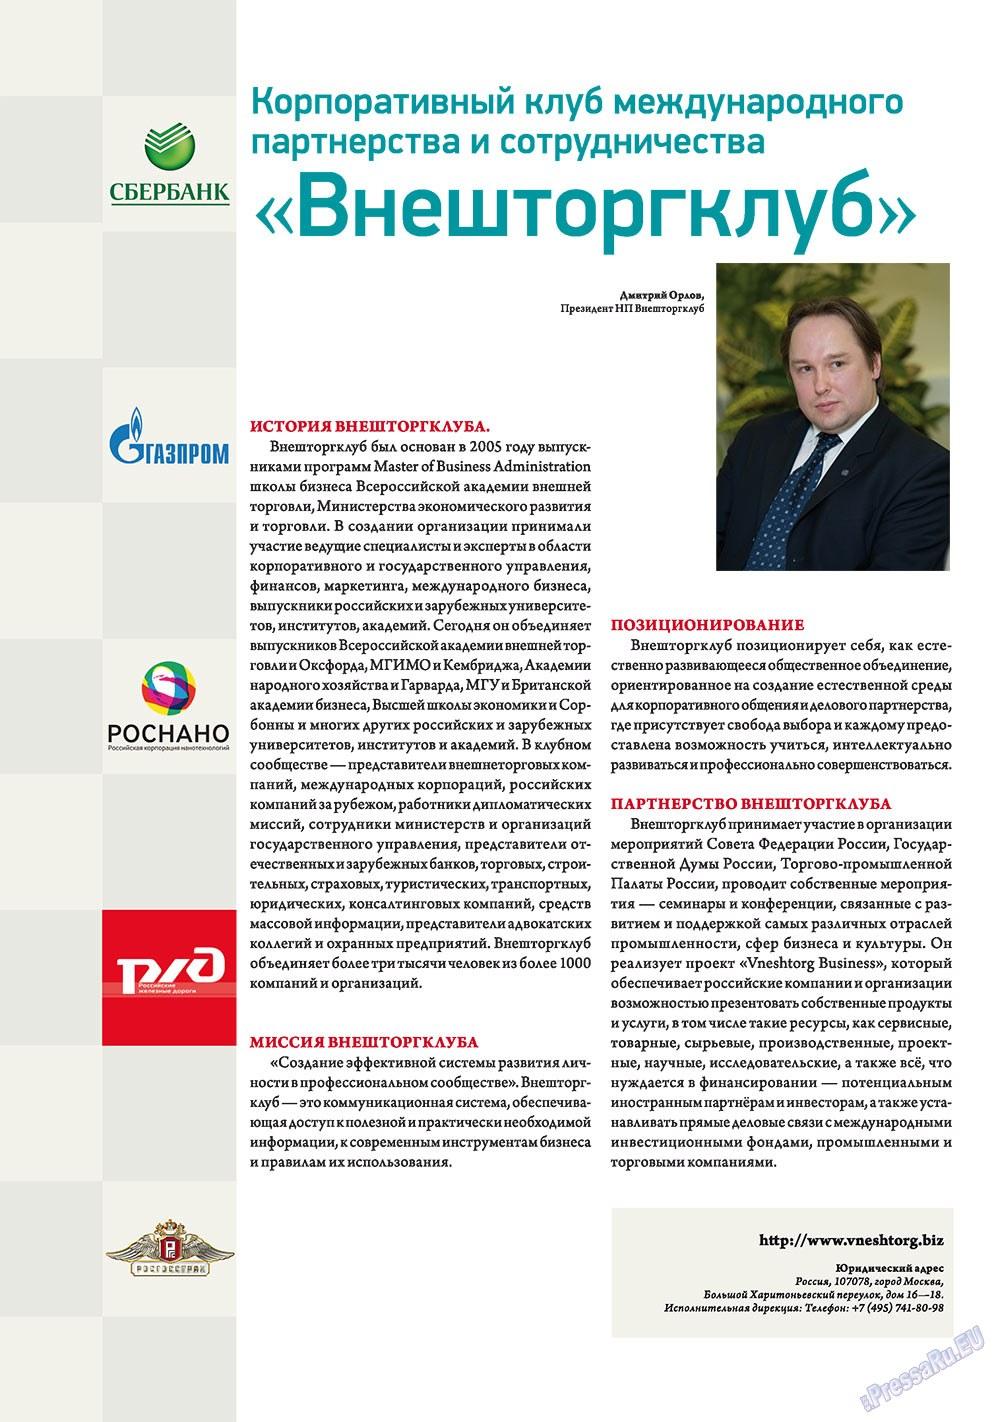 Бизнес парк (журнал). 2011 год, номер 5, стр. 6